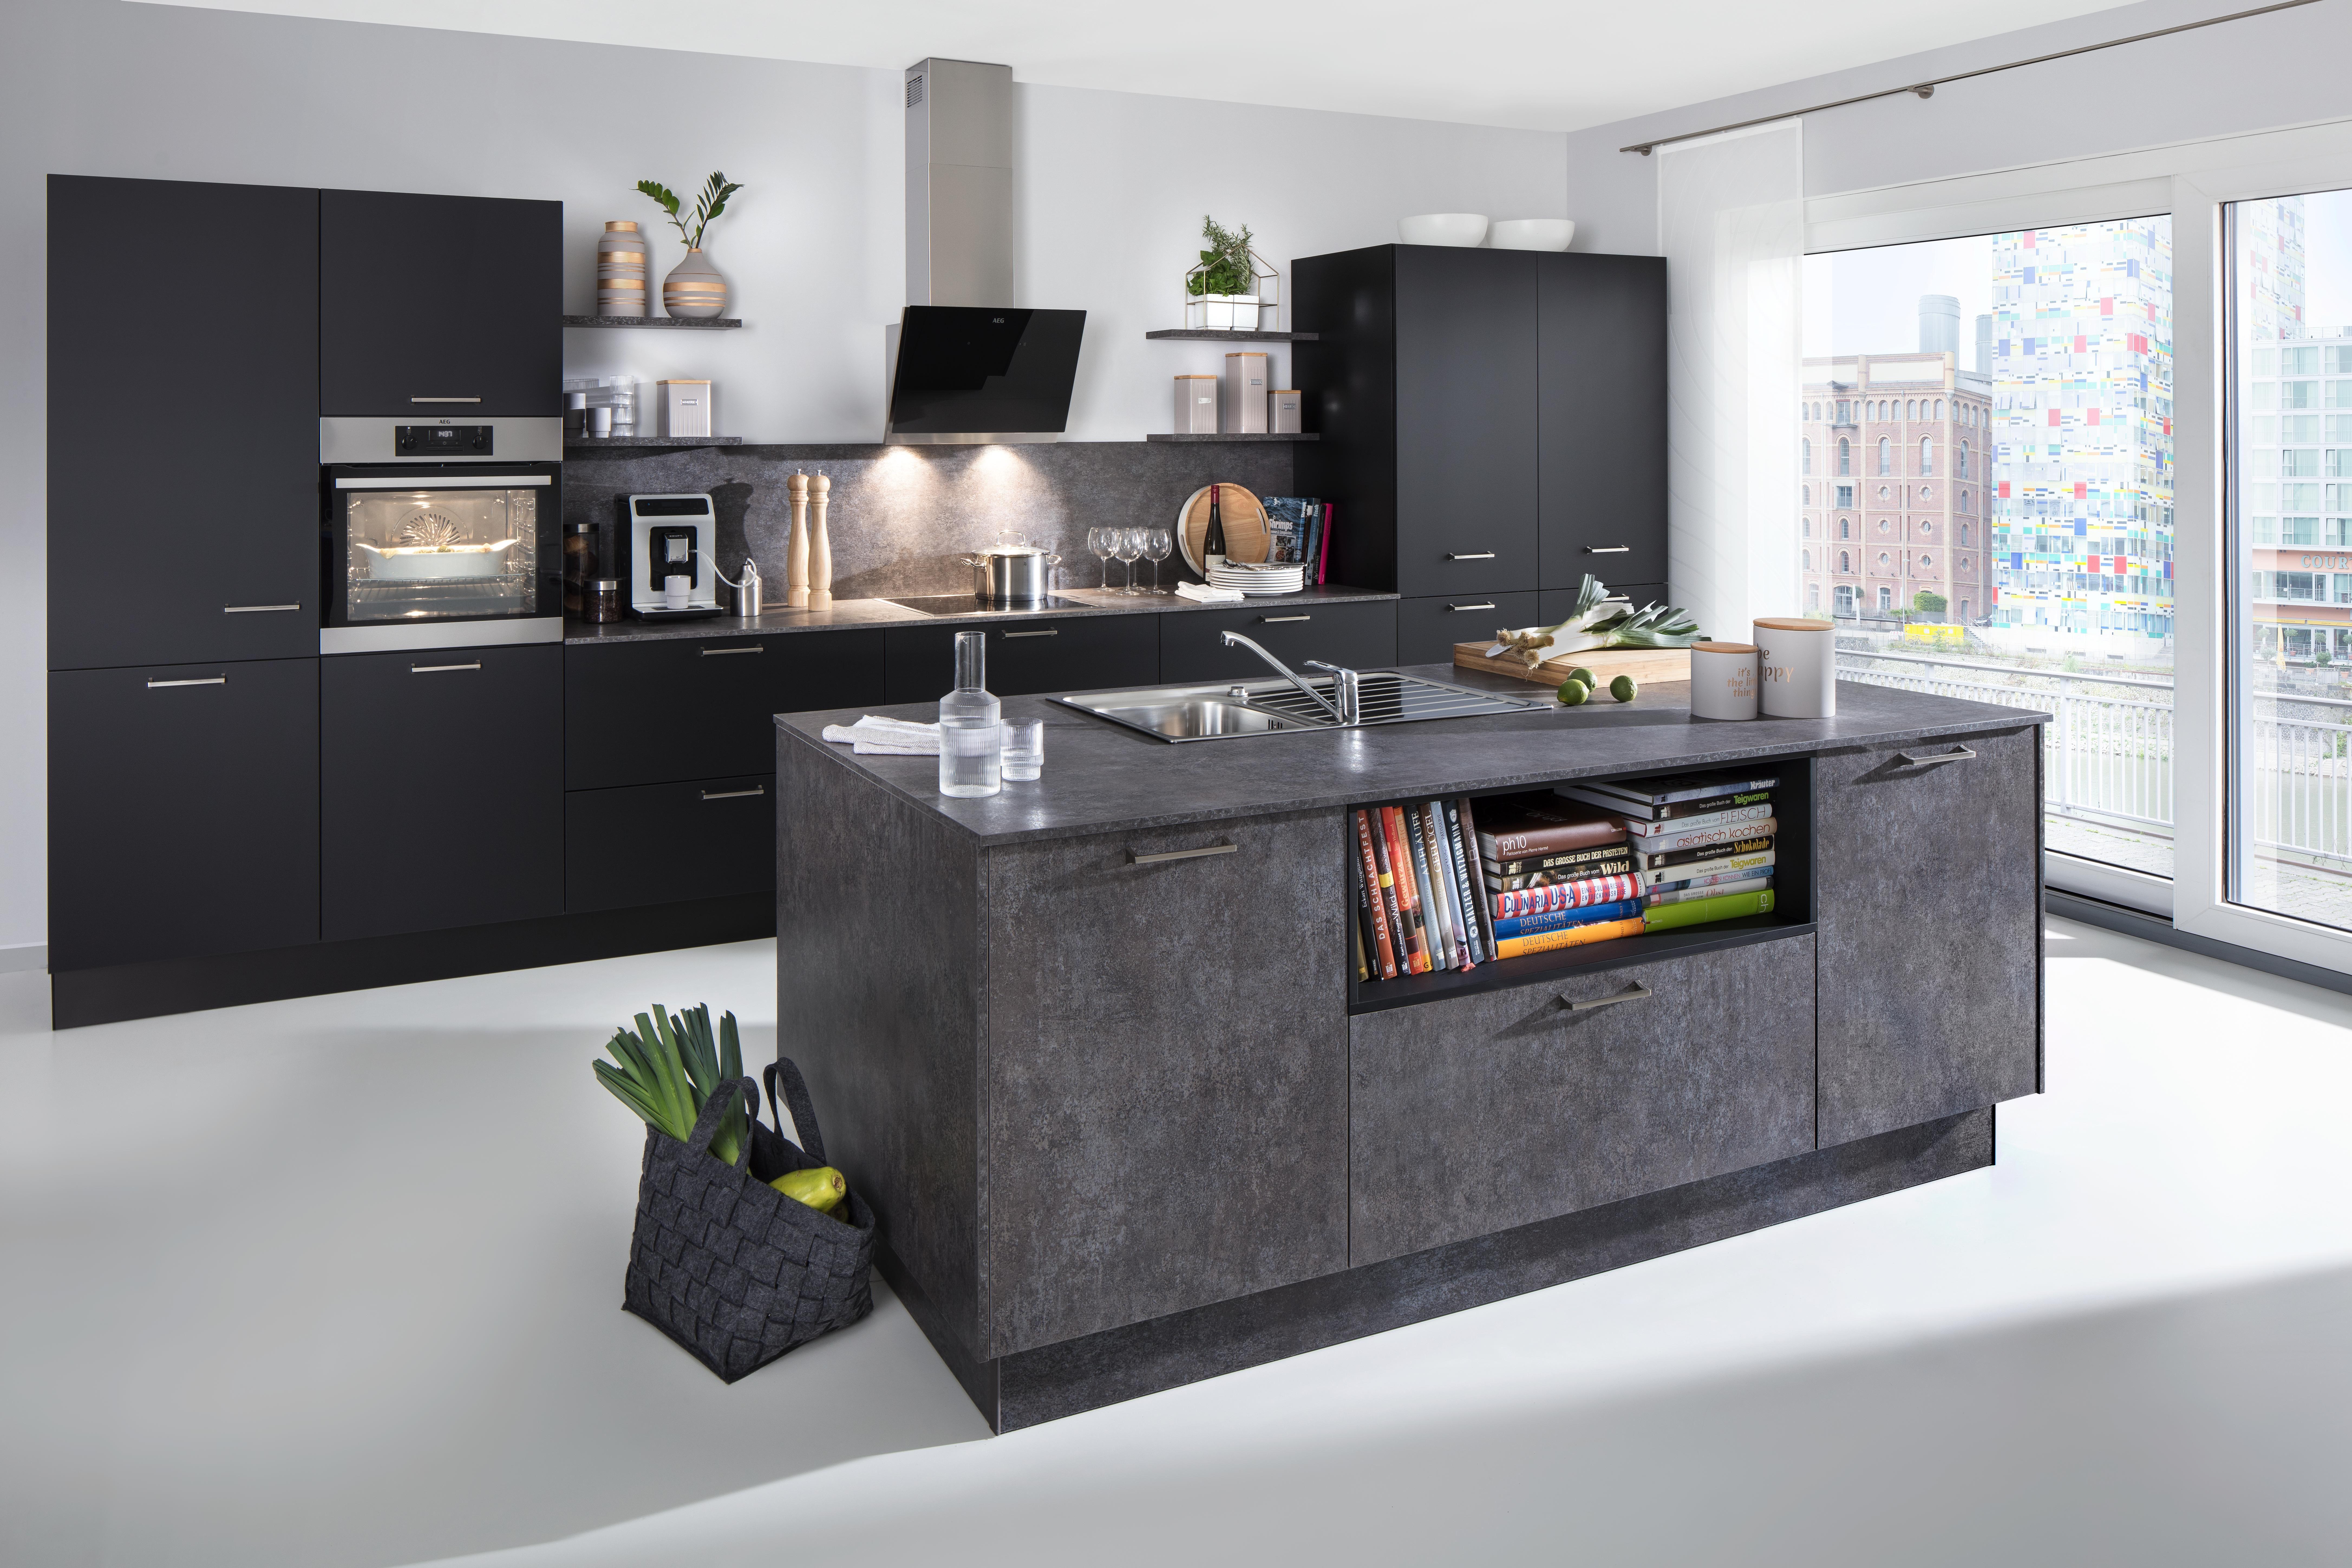 Graue Design Kuche In Betonoptik Mit Kochinsel Kuchen Design Kuche Umgestalten Kuchendesign